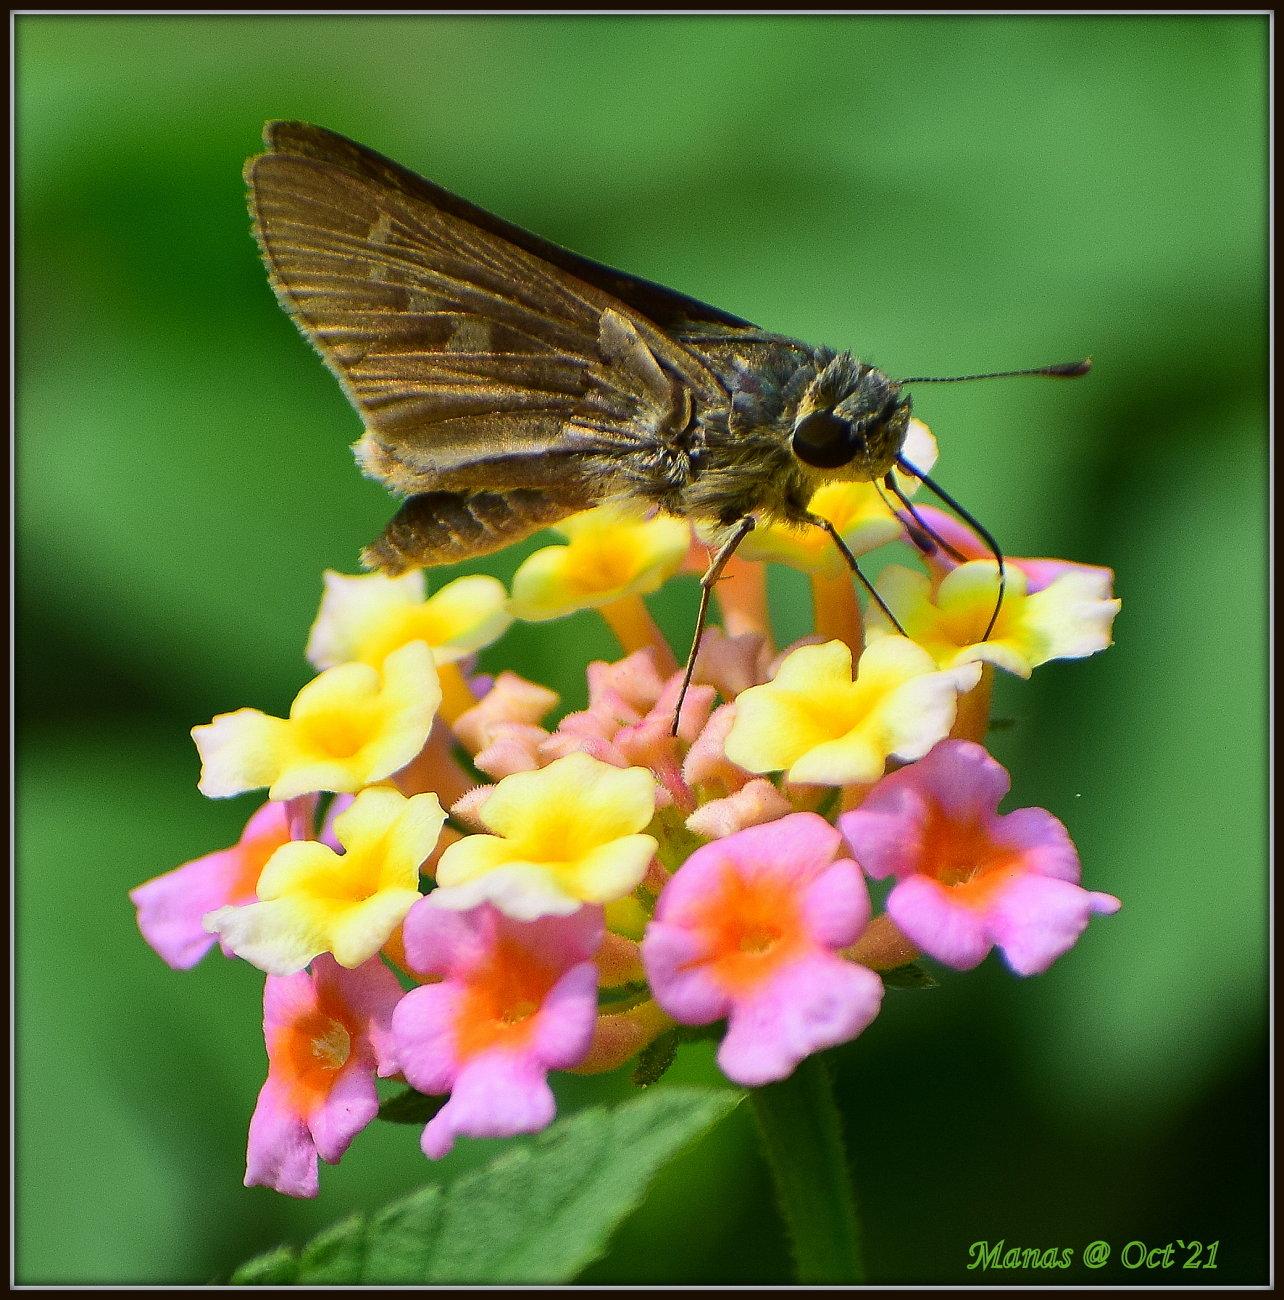 Butterfly cherishing nectar